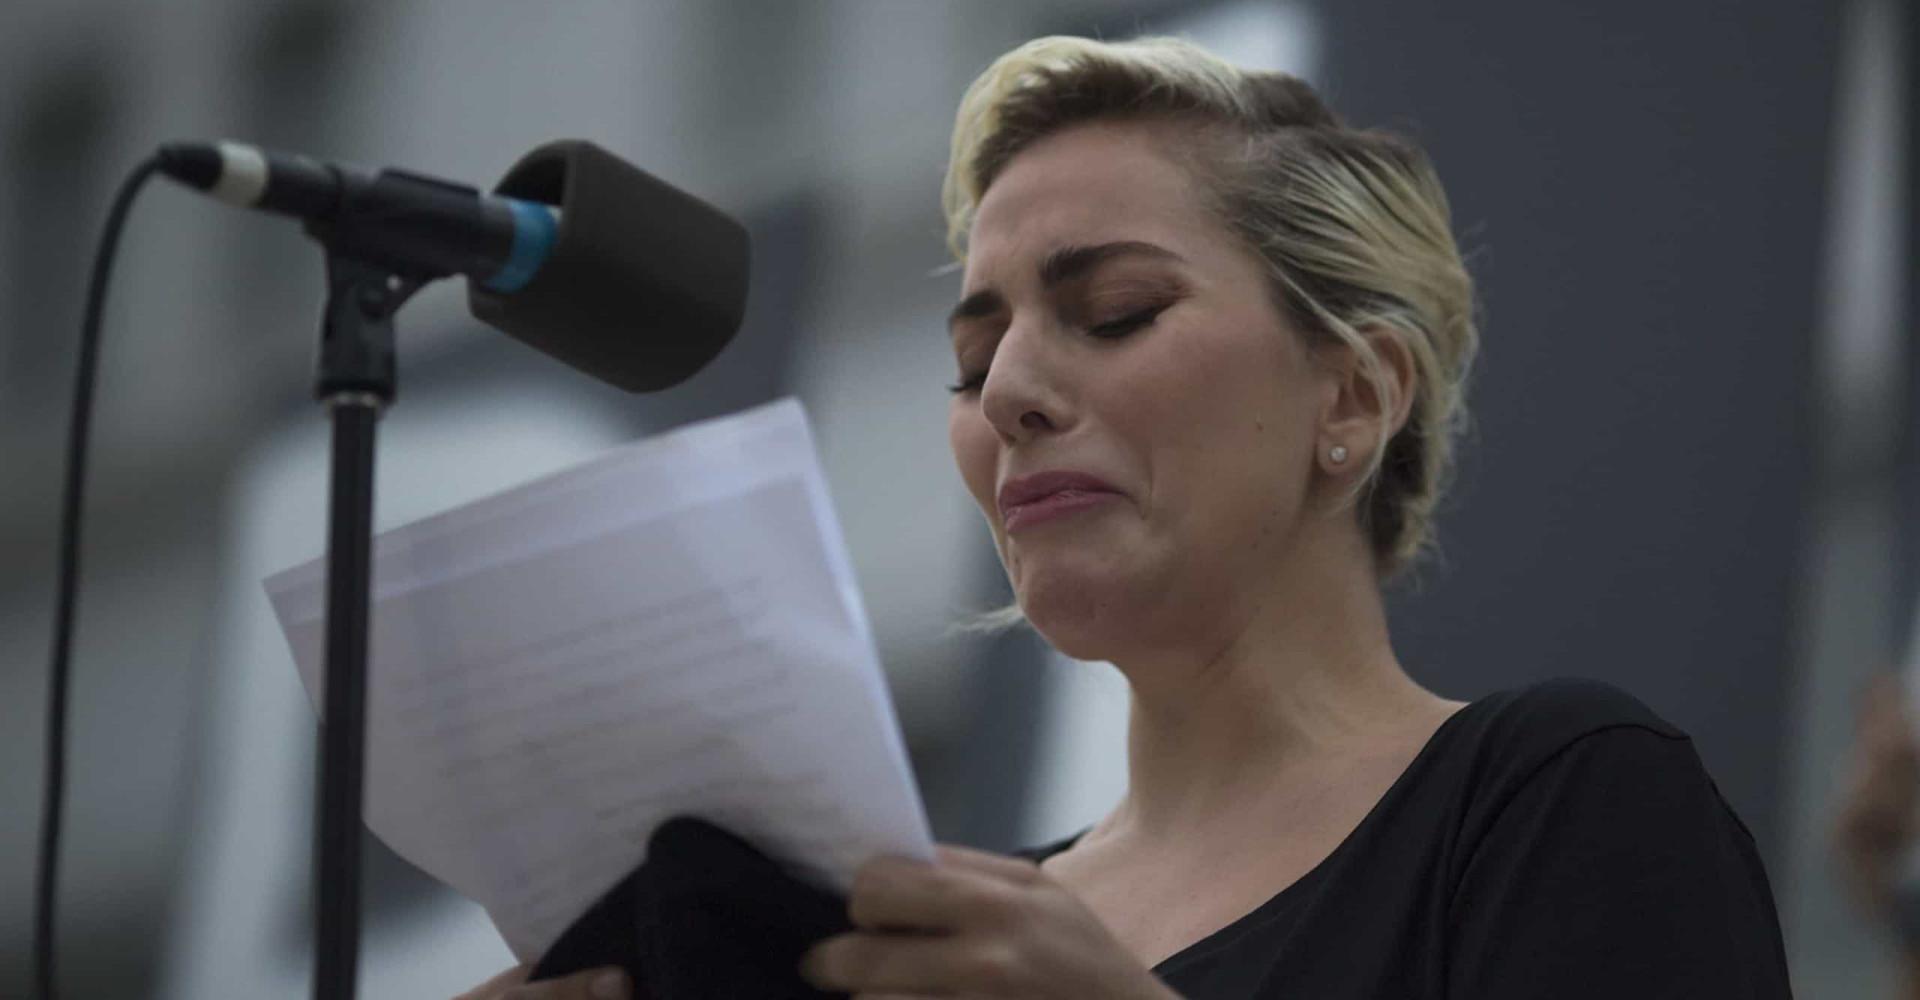 Lady Gaga delivers hard truths in emotional mental health essay